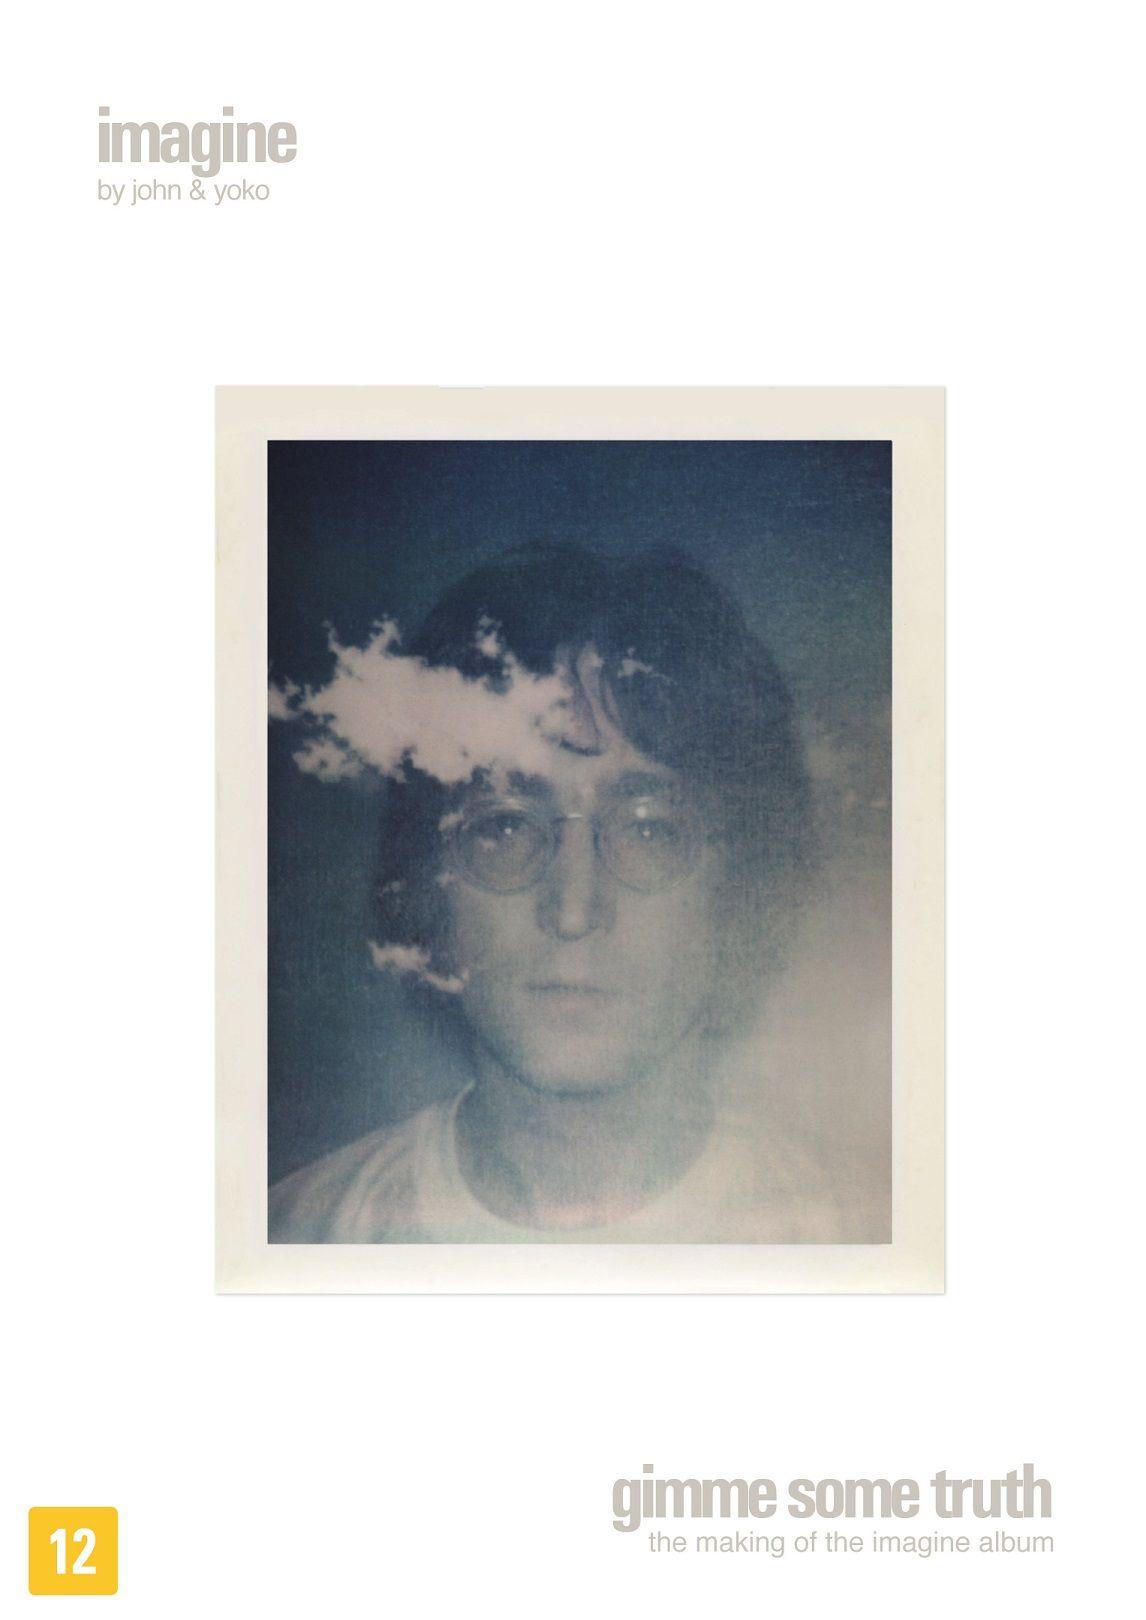 John Lennon & Yoko Ono - Imagine & Gimme Some Truth - DVD